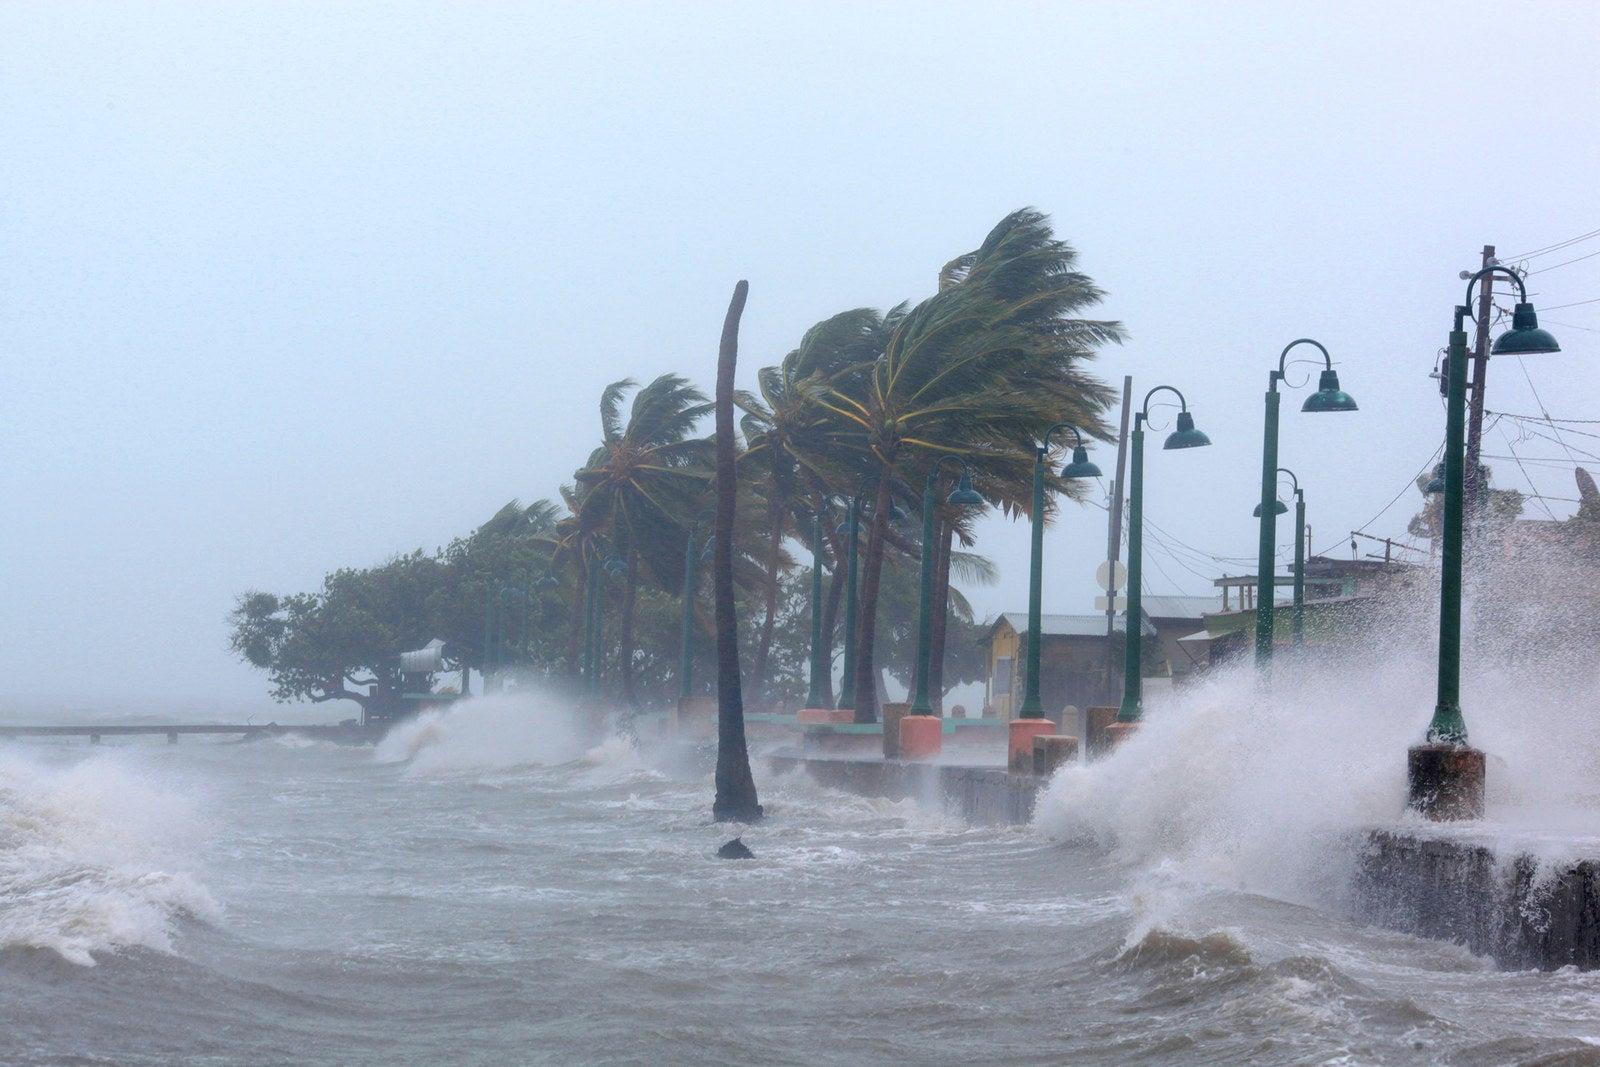 Waves crash against a seawall as Hurricane Irma slams Fajardo, Puerto Rico, on Wednesday.